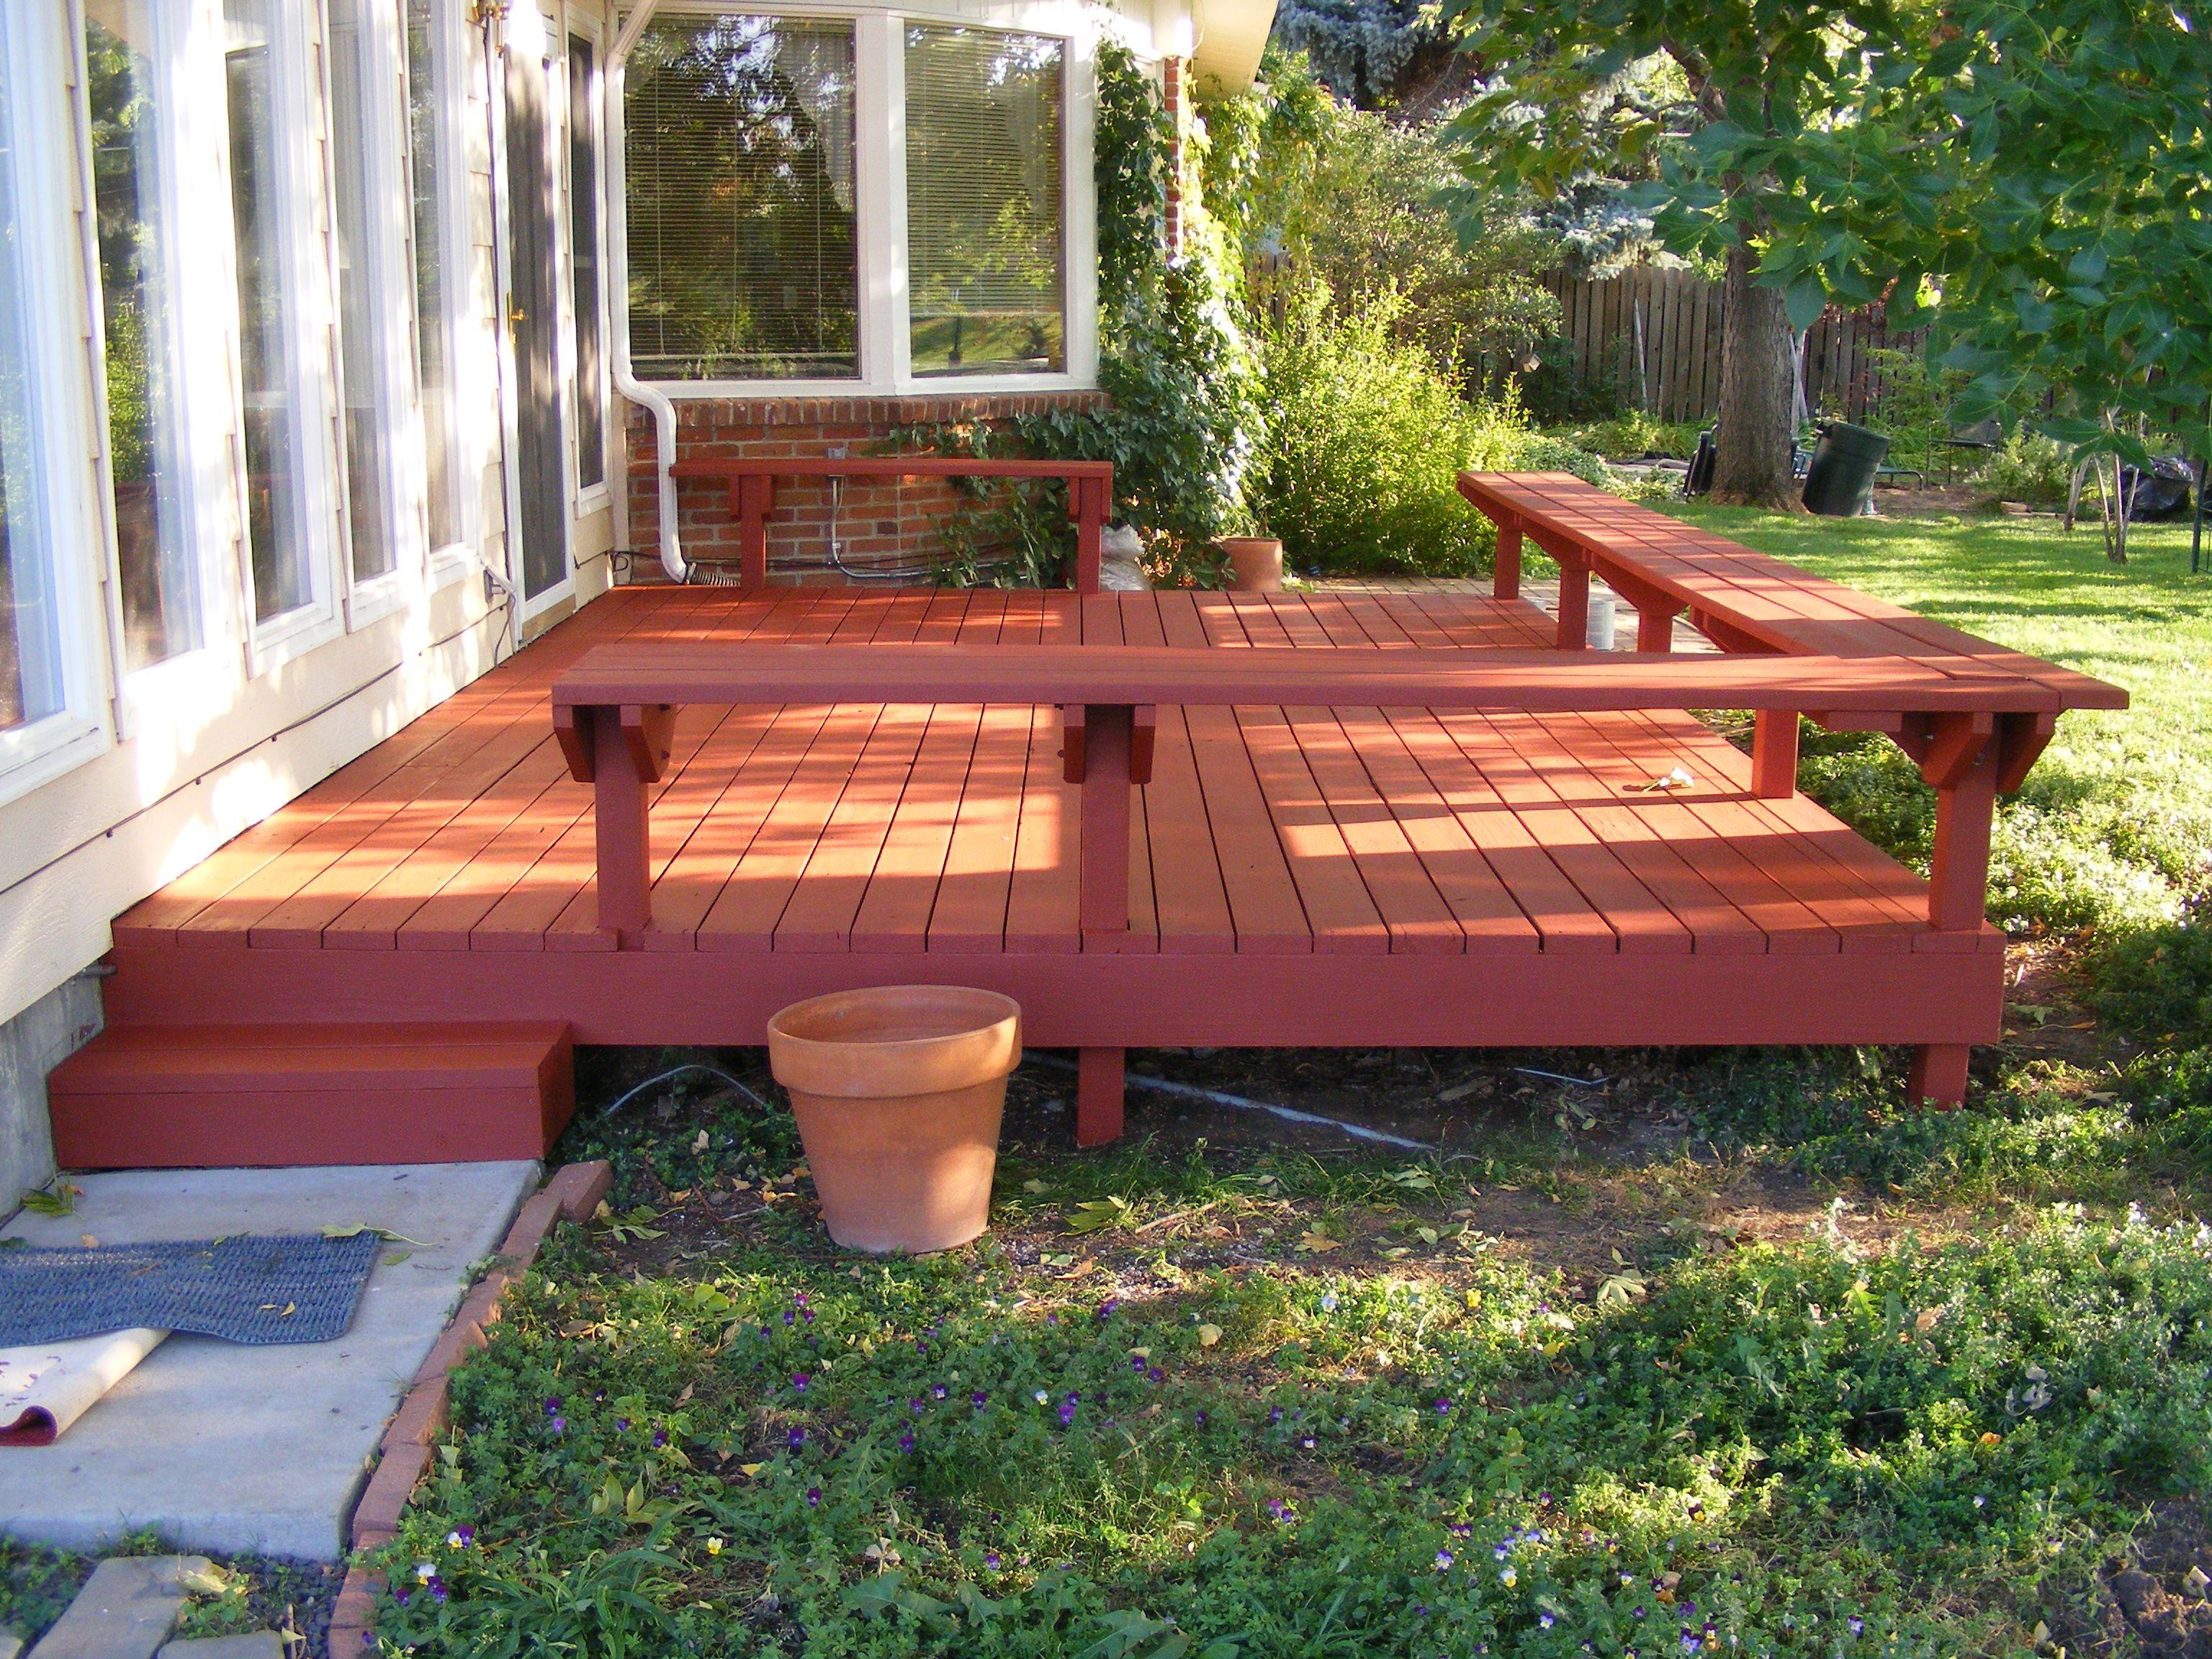 simple deck w/ bench | Decks backyard, Curved pergola ... on Simple Back Deck Ideas id=33705